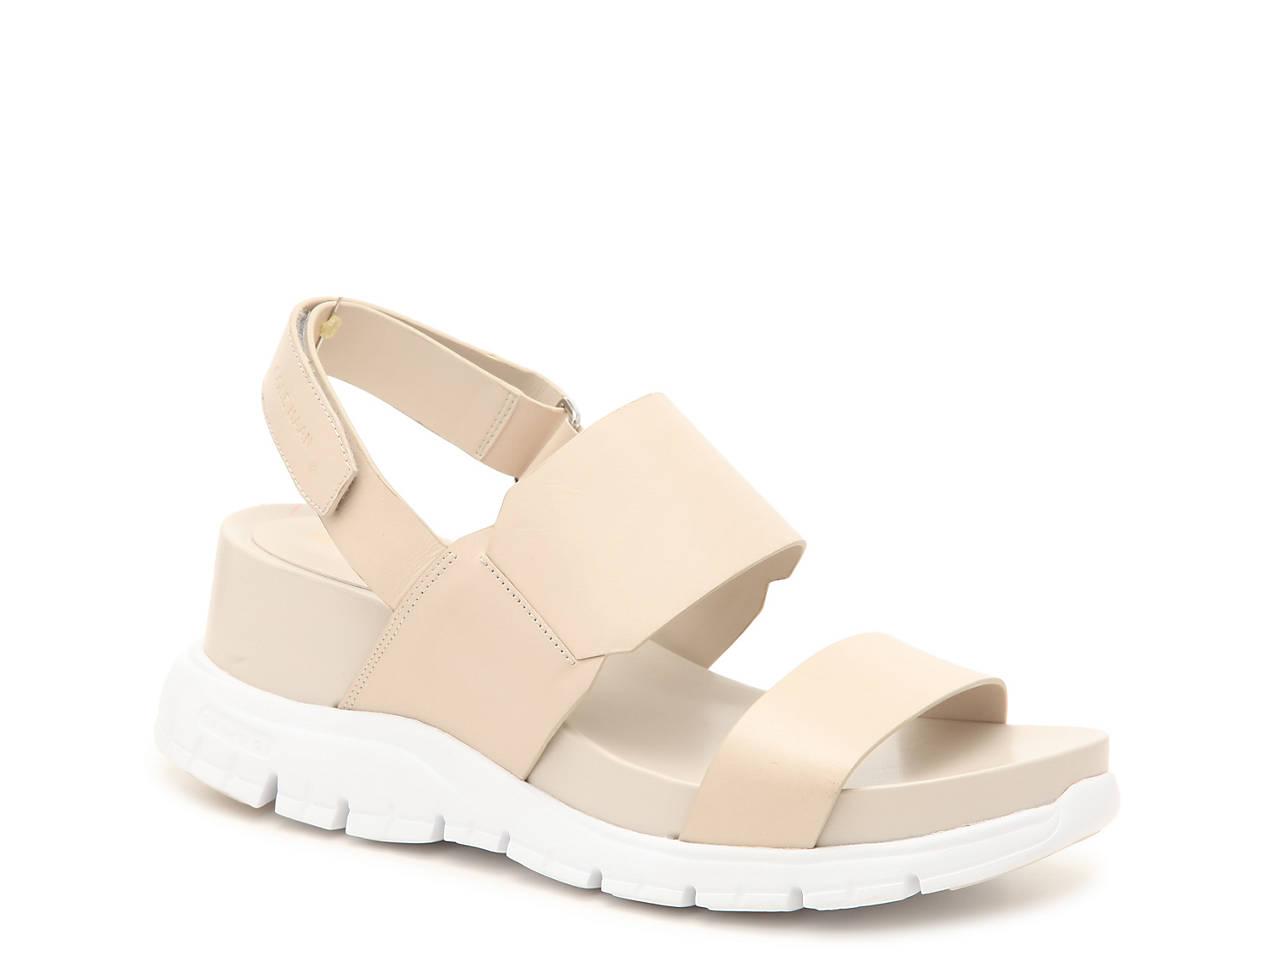 8cb2b4a3aa2a Cole Haan Zerogrand Wedge Sandal Women s Shoes